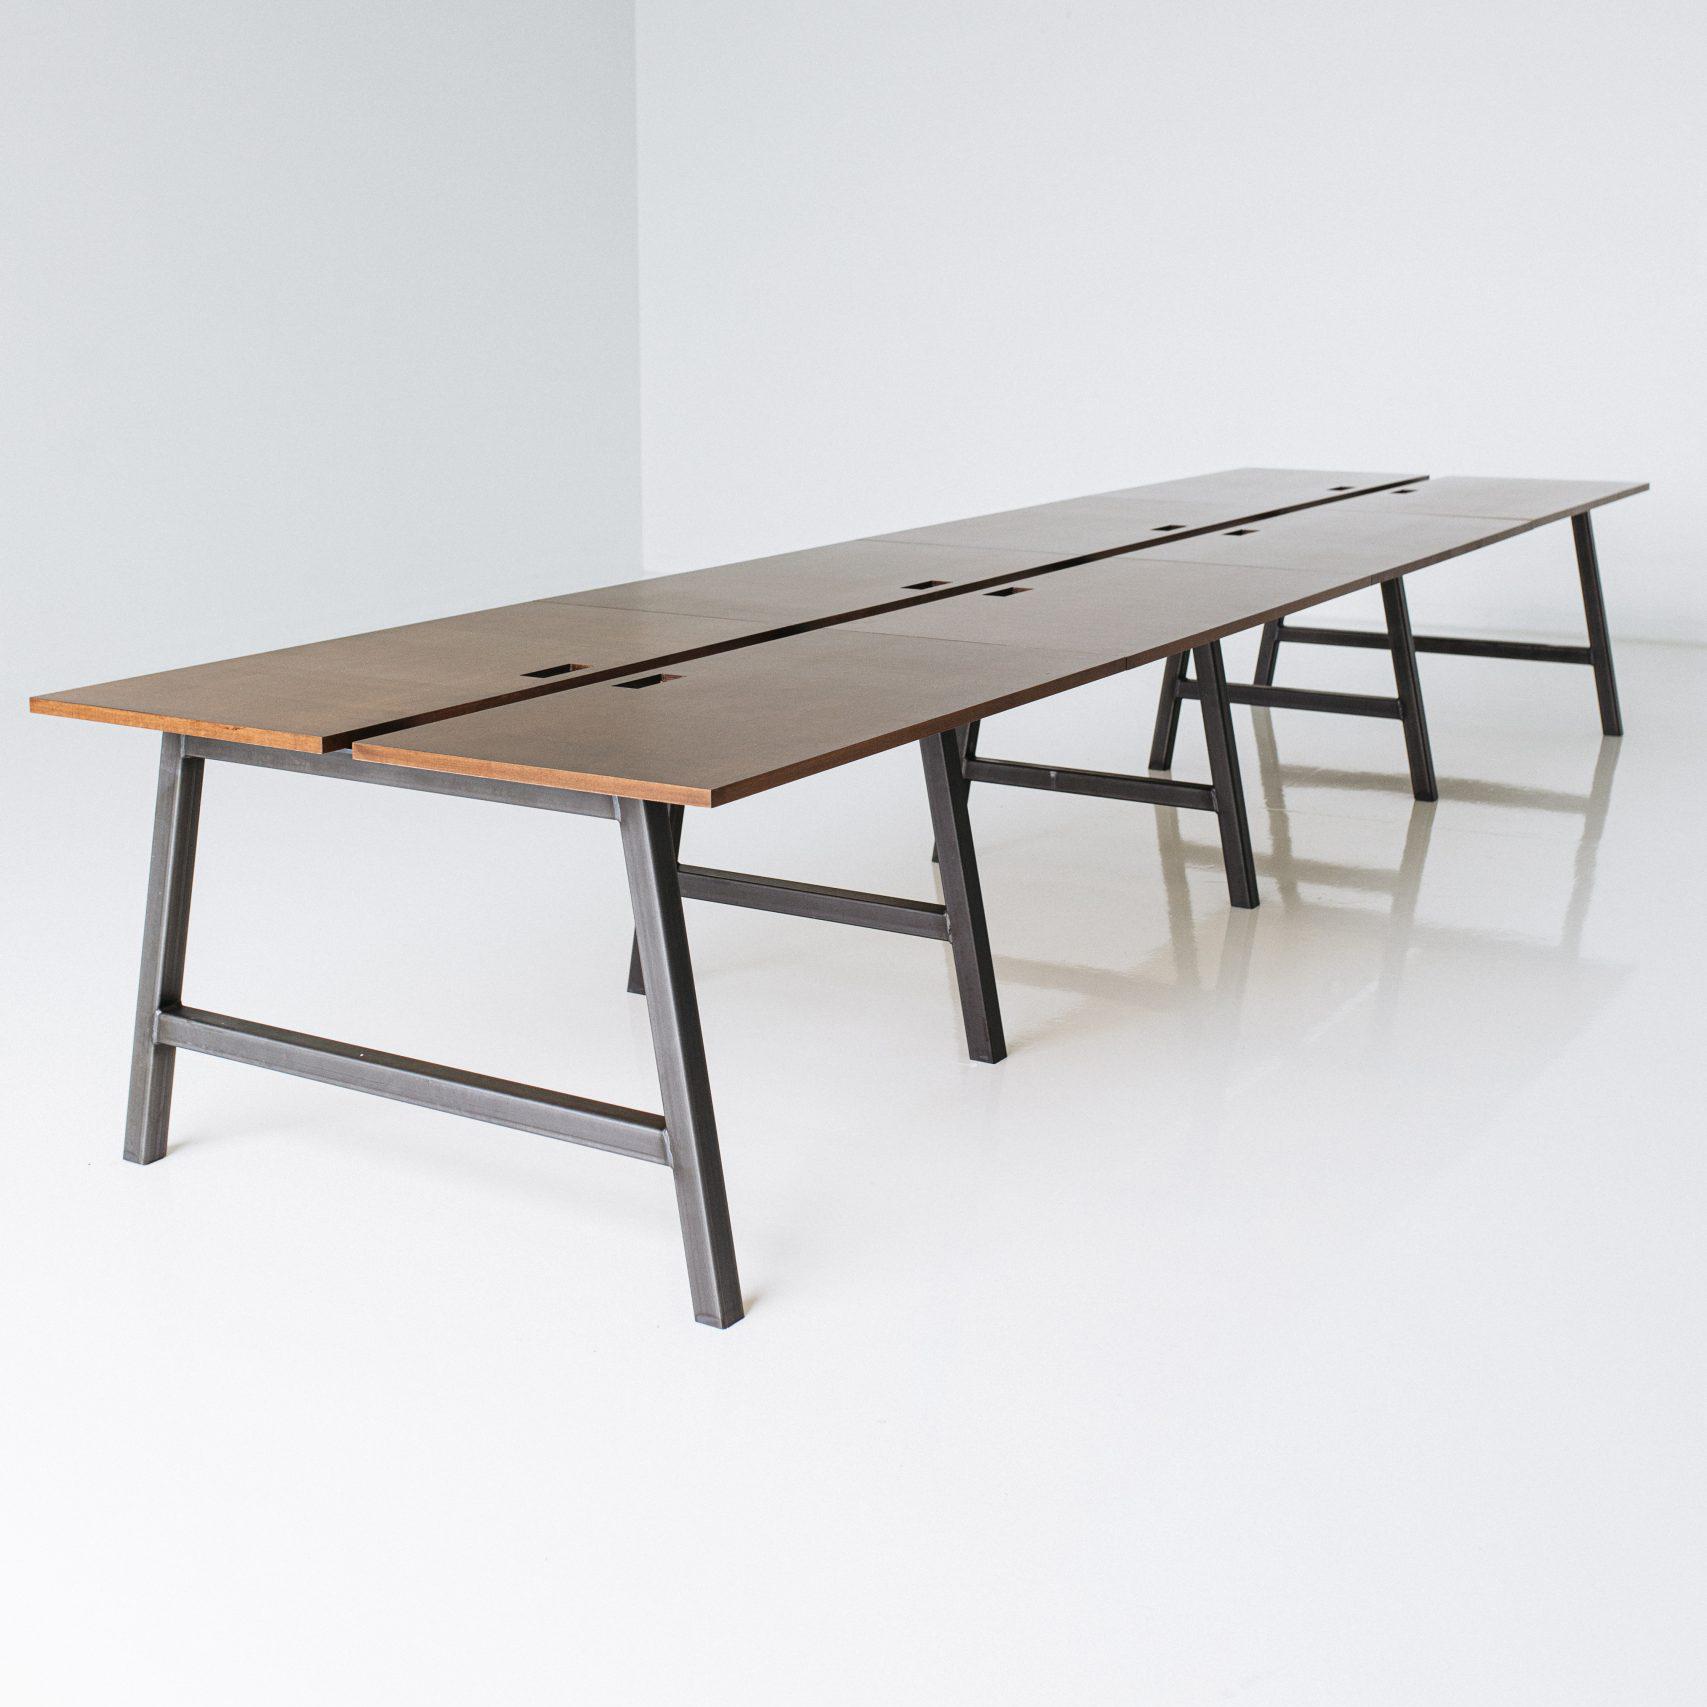 wood meeting room table